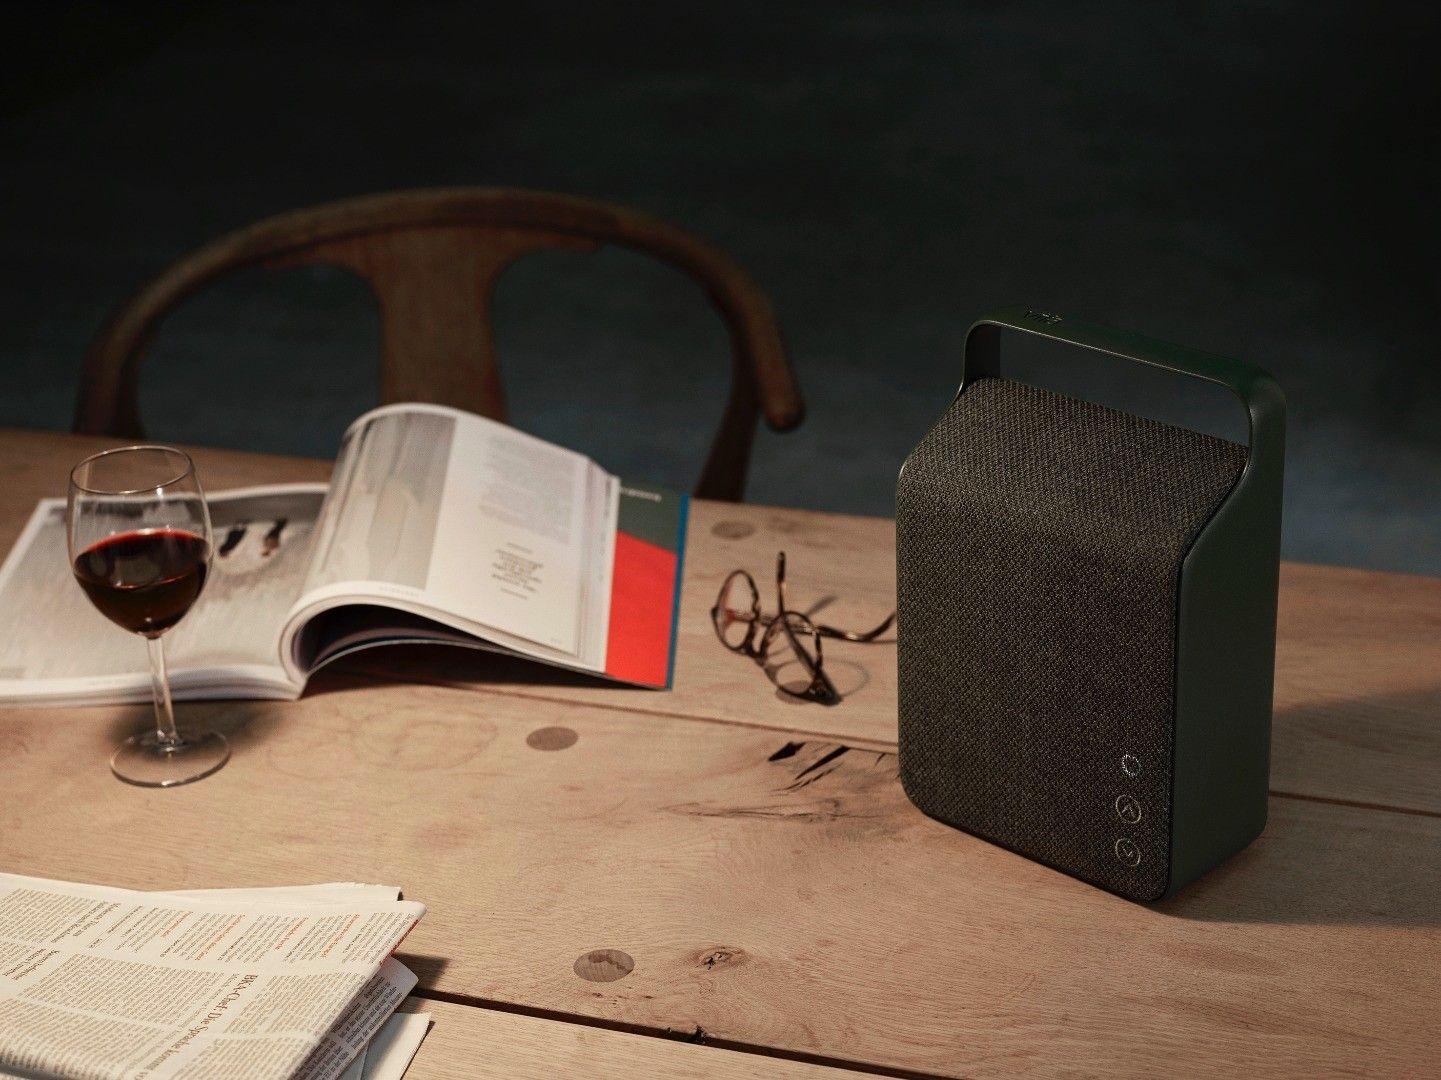 Recenzja VIFA OSLO – duński mobilny głośnik klasy premium